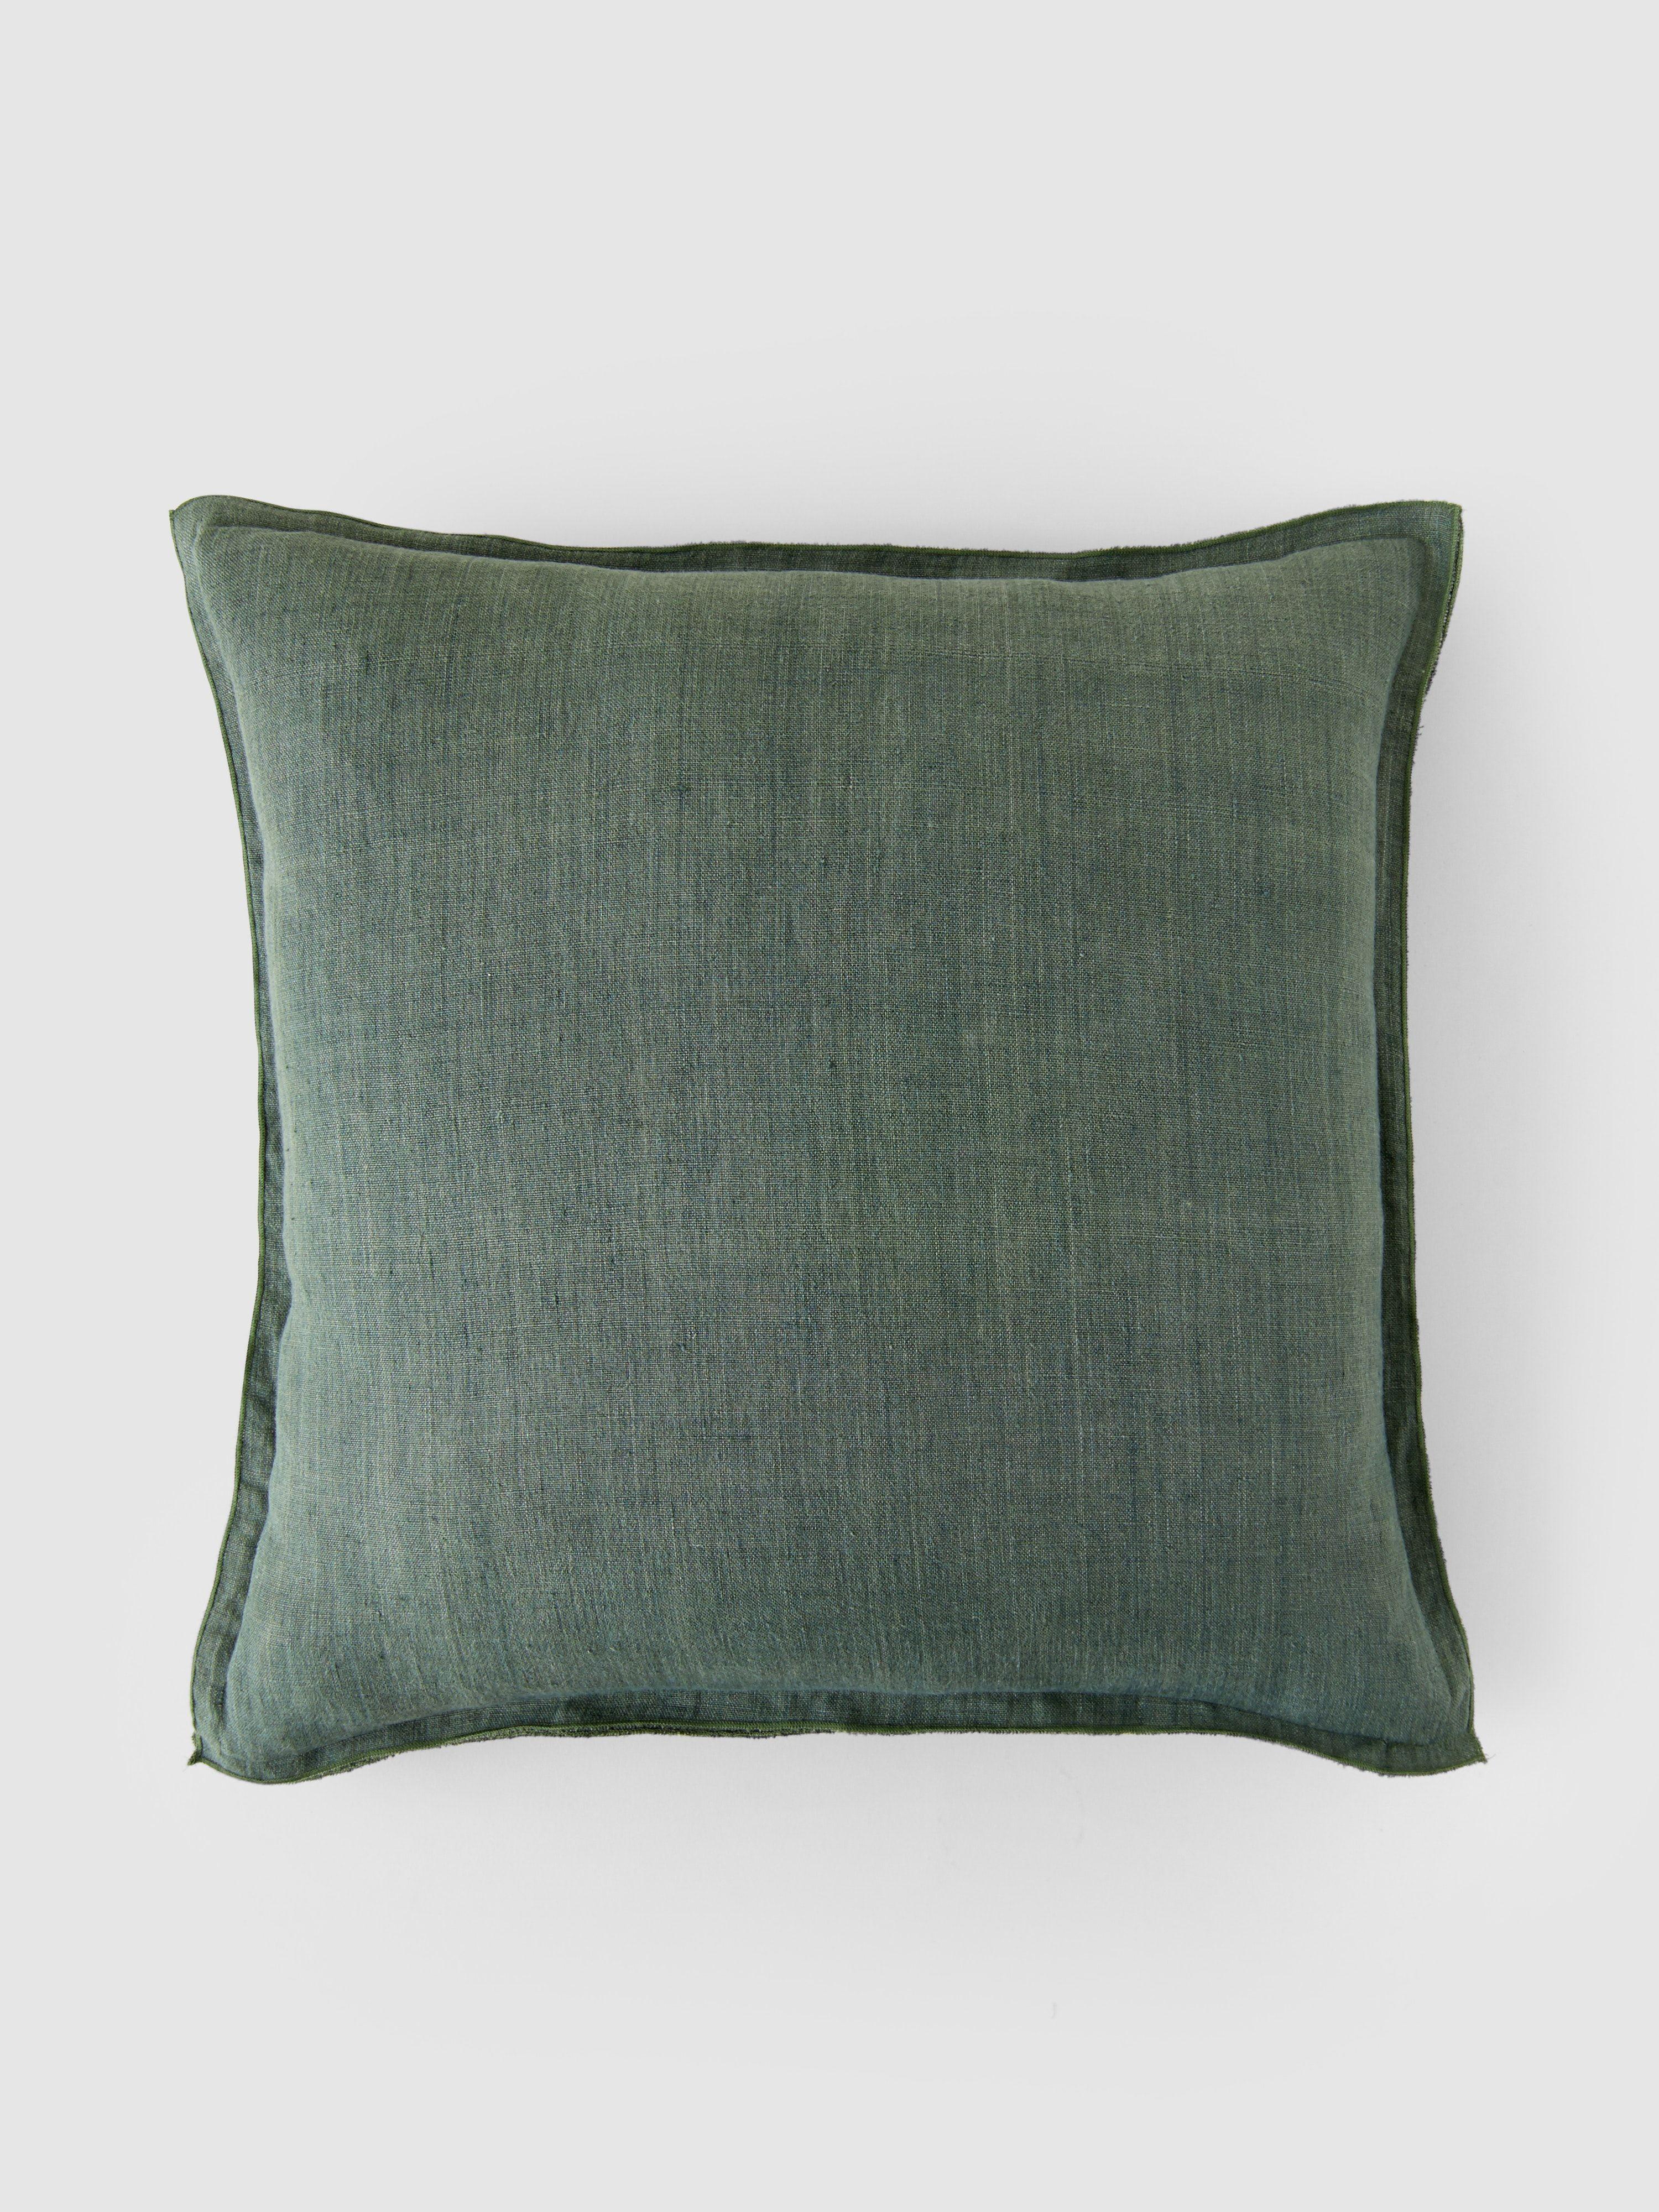 Bungalow Denmark Linen Thyme Cushion Cover Stylish Throw Pillows Cushion Cover Unique Decorative Pillows